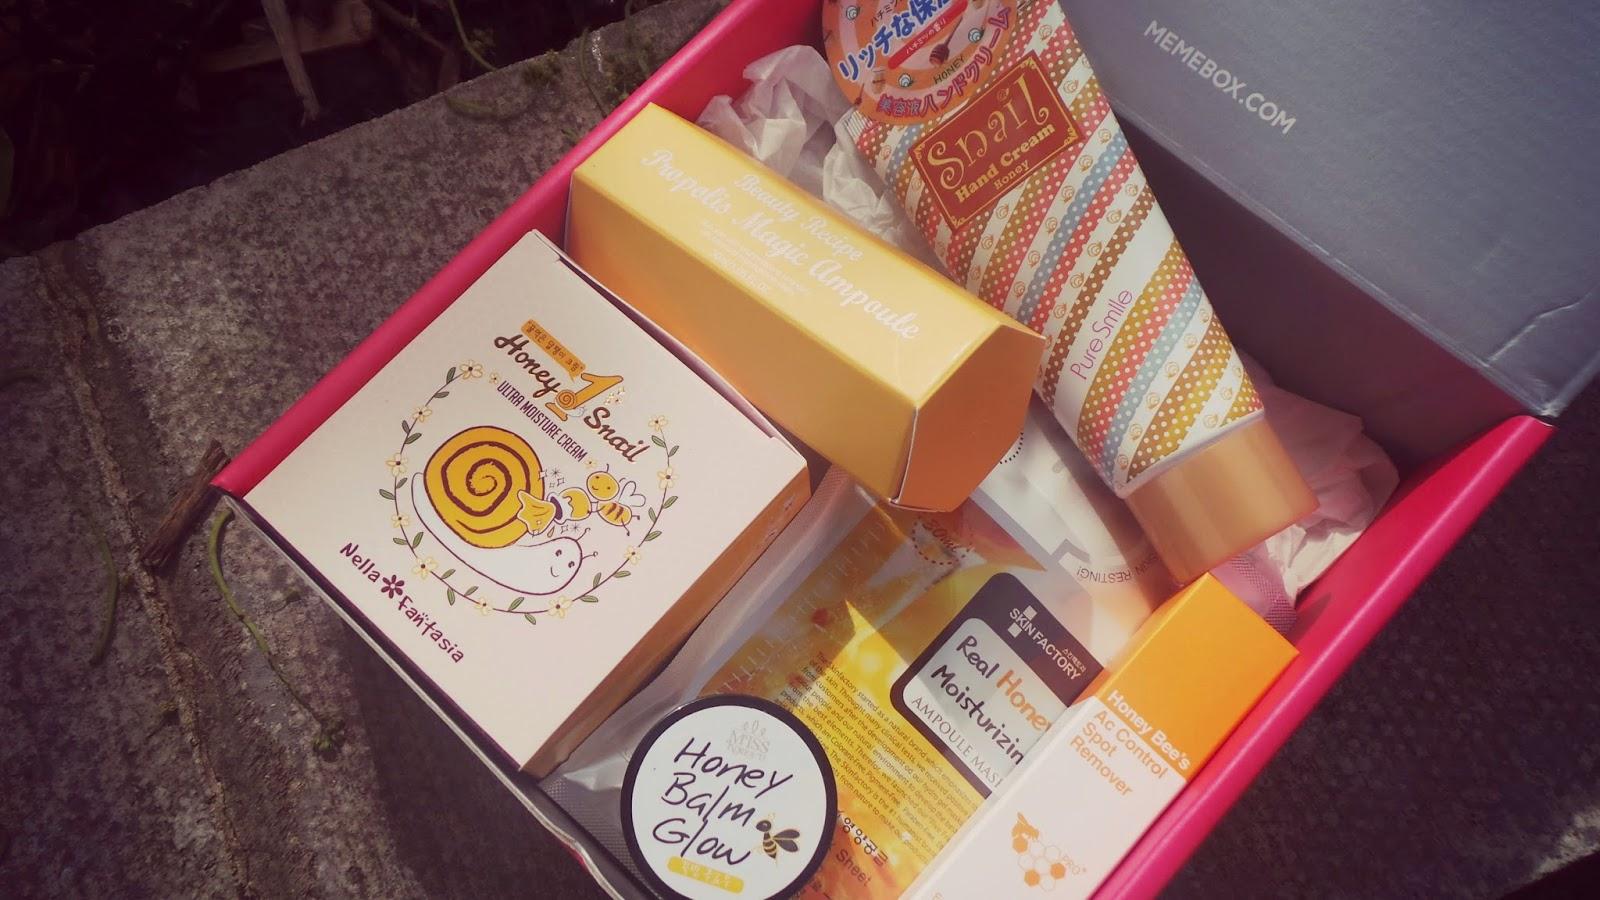 Korean beauty products containing Honey